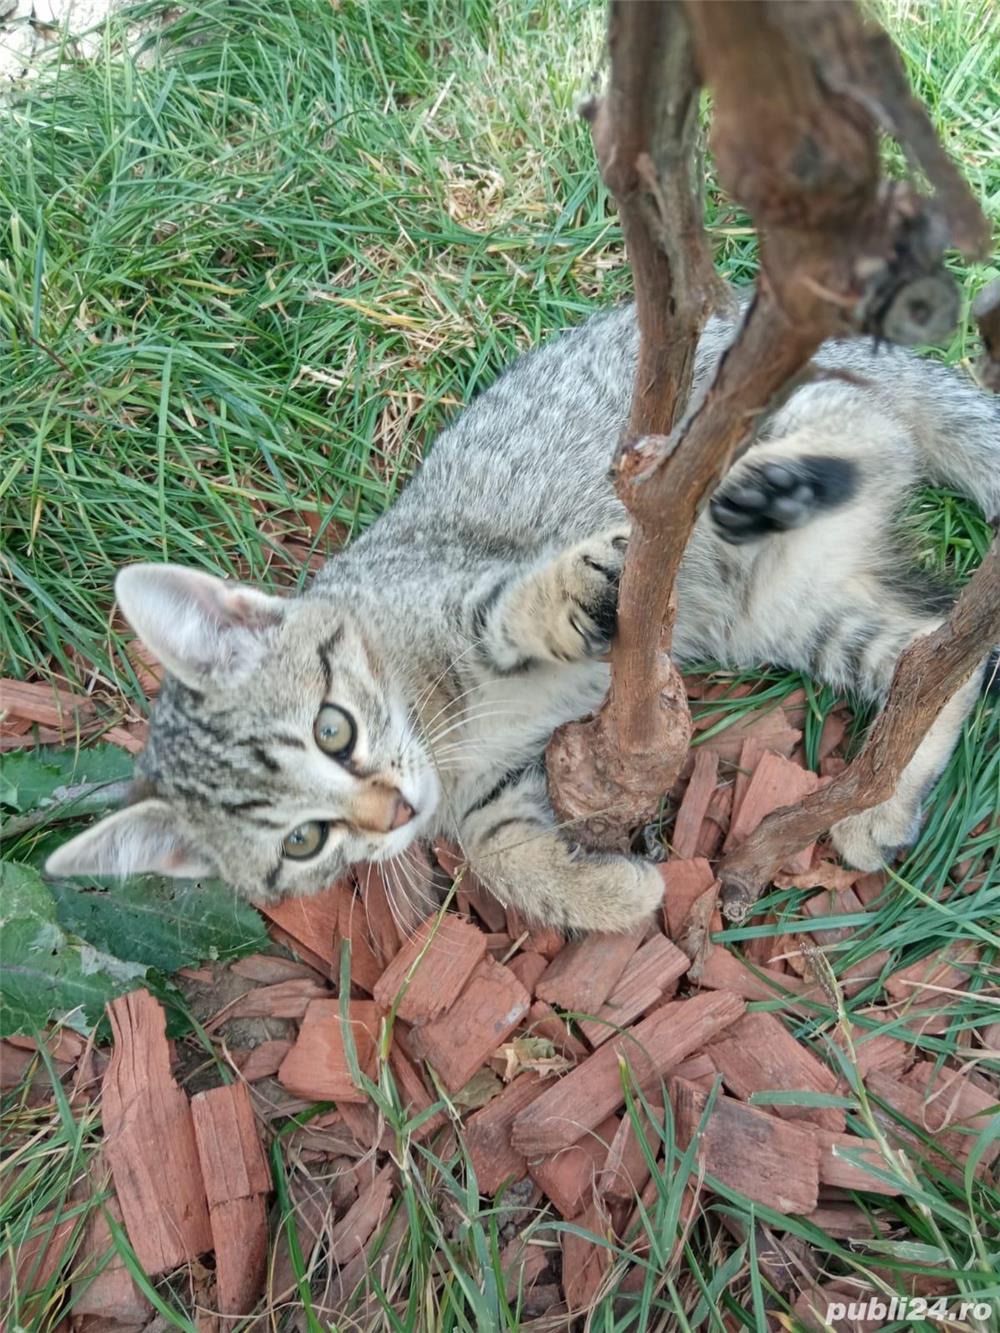 ofer gratis pui de pisica